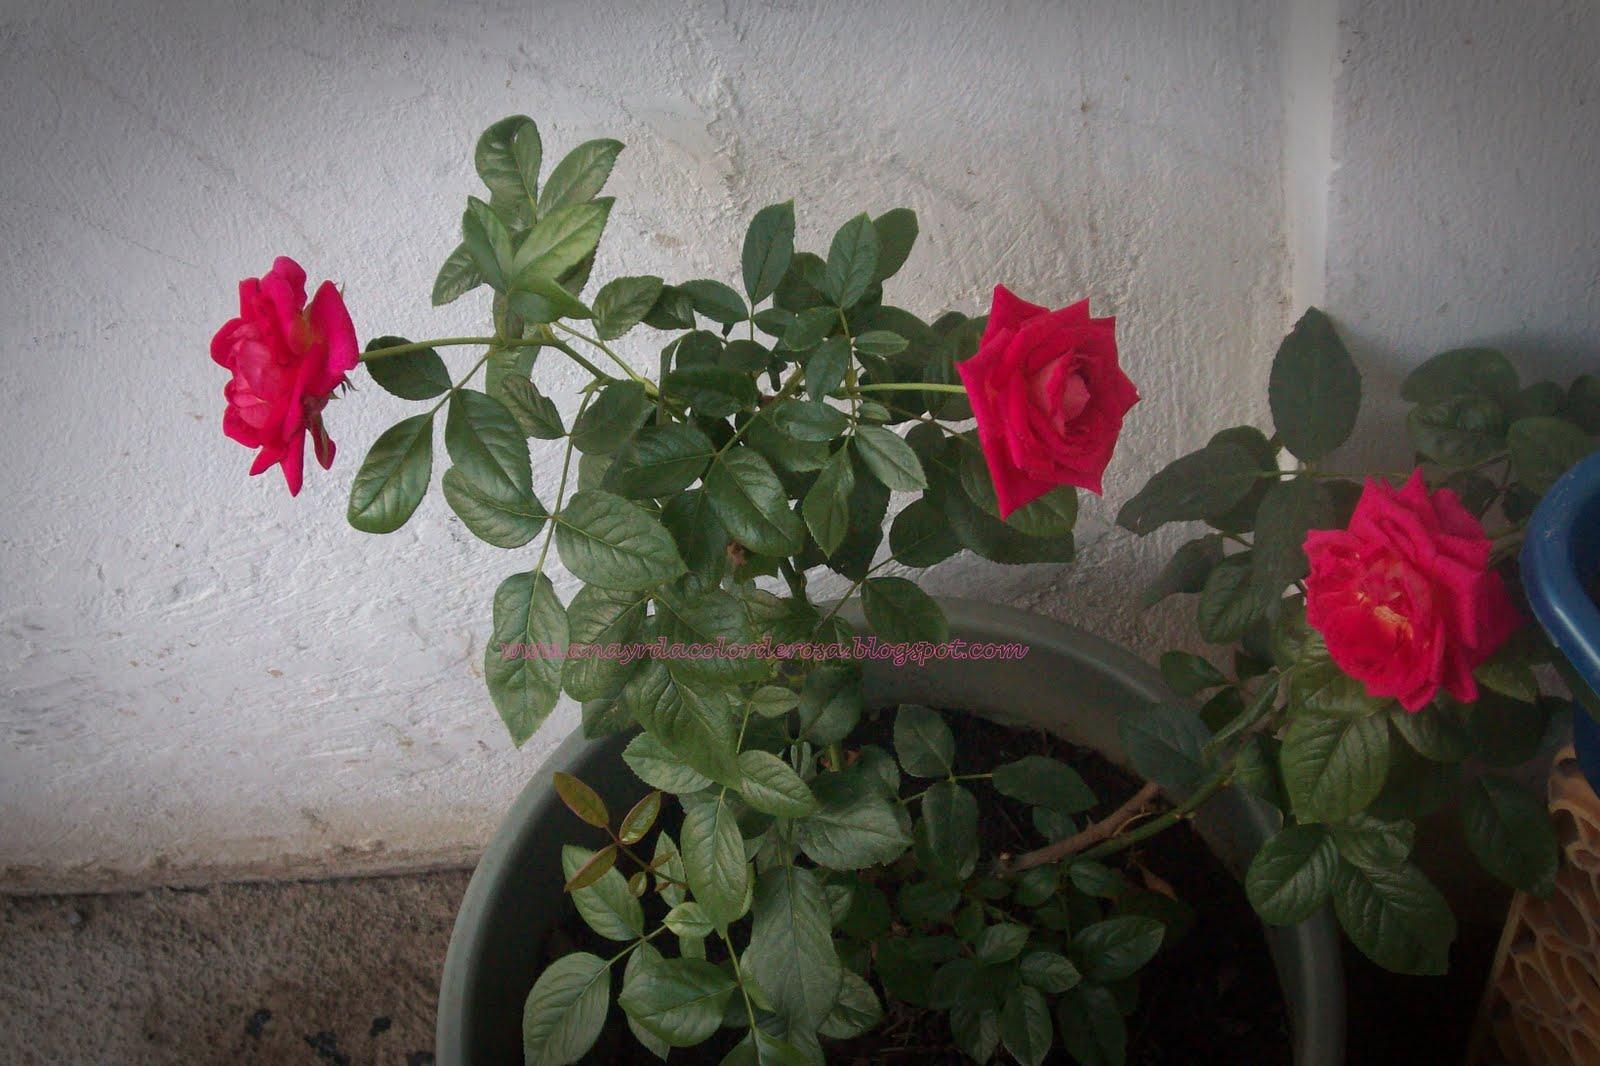 Imagenes De Flores Teresitas - Anterior Vicaria, Vinca de Madagascar (Catharanthus Roseus)